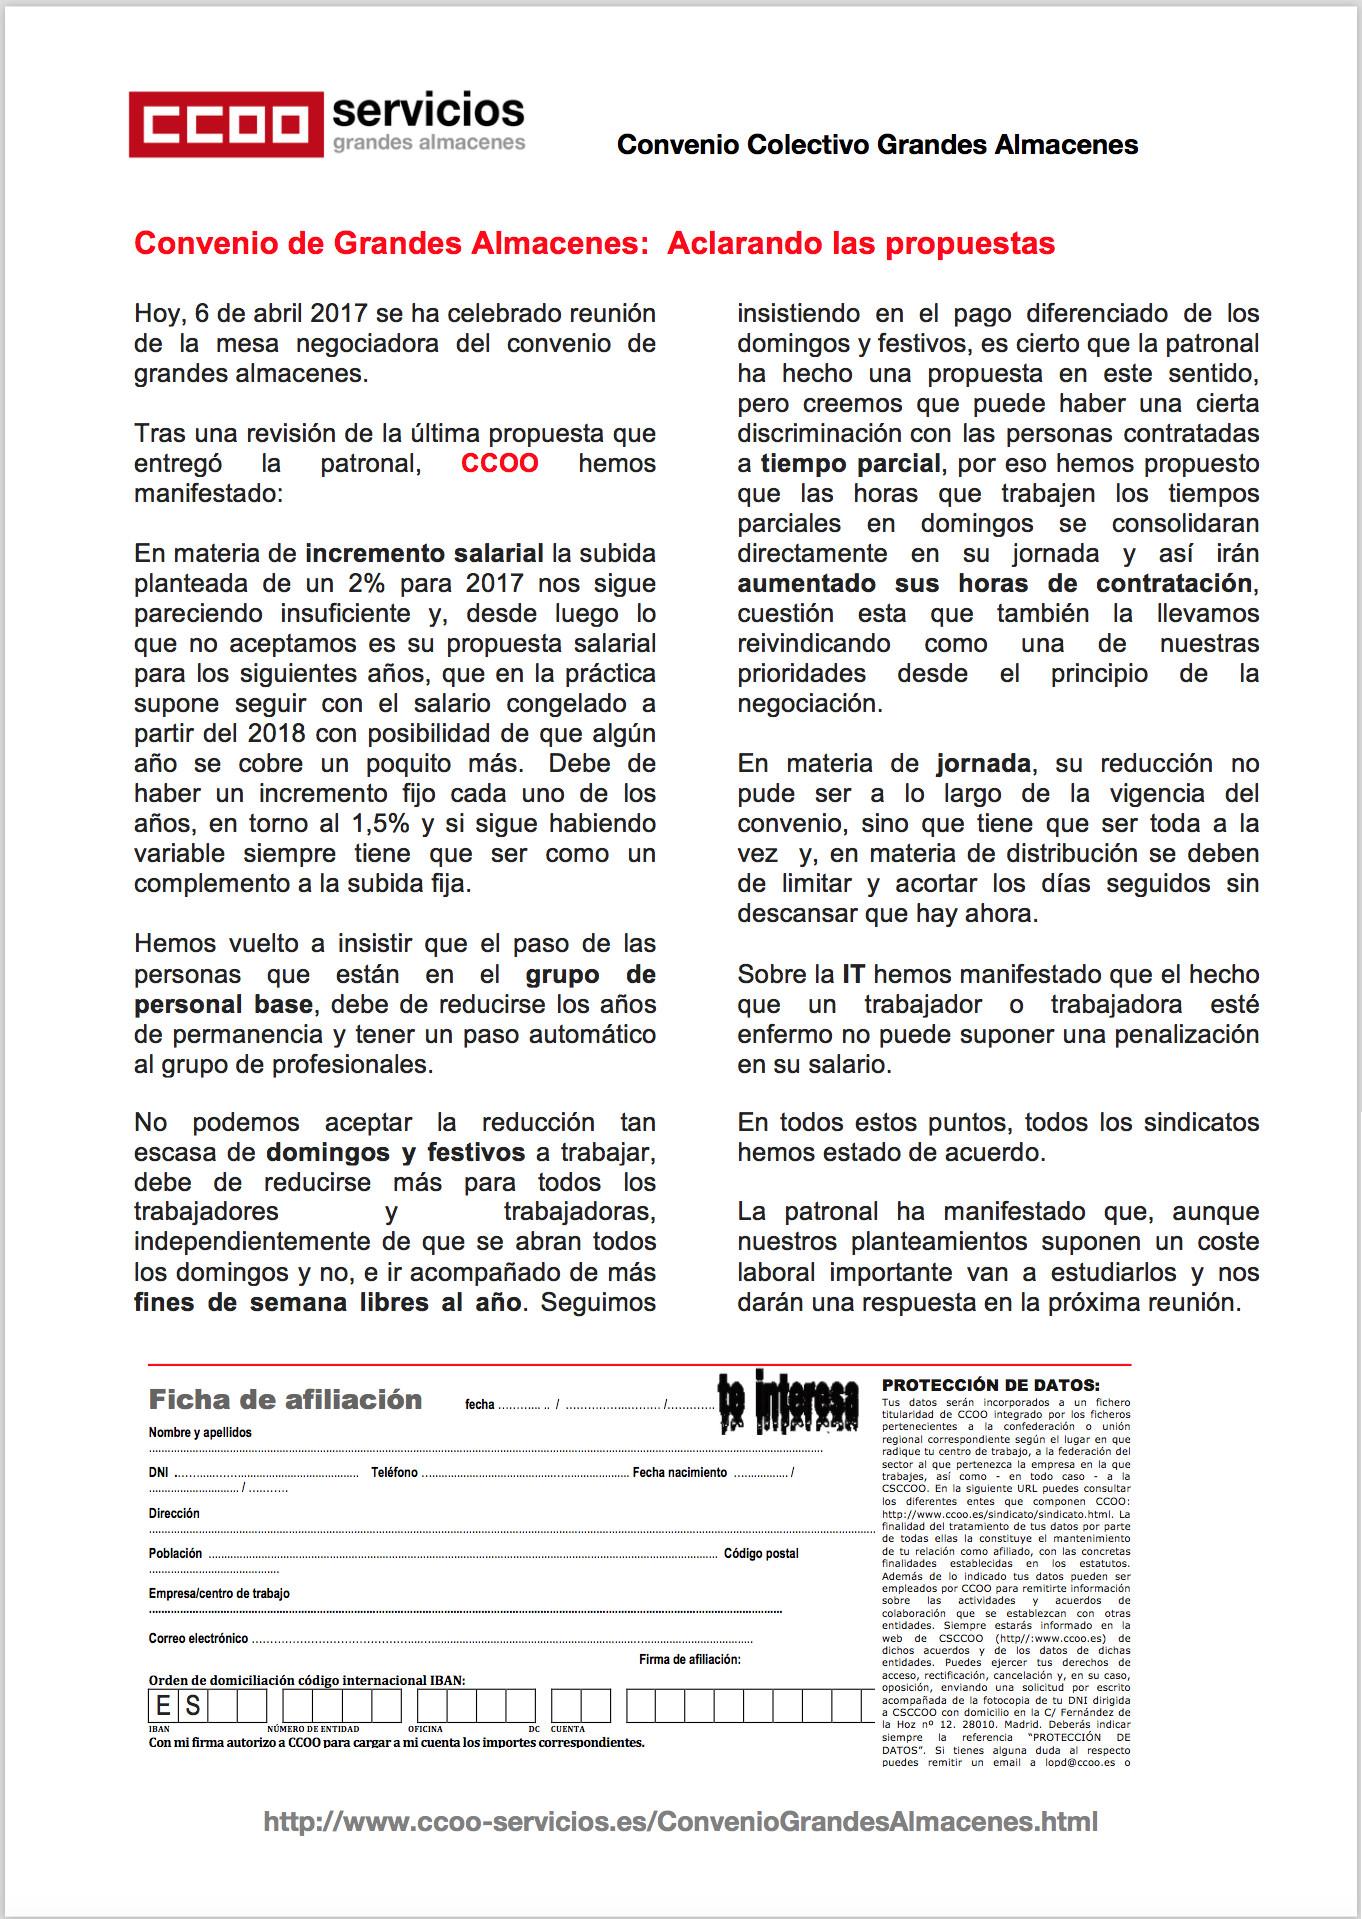 Pagina 1 del quinto comunicado GGAA